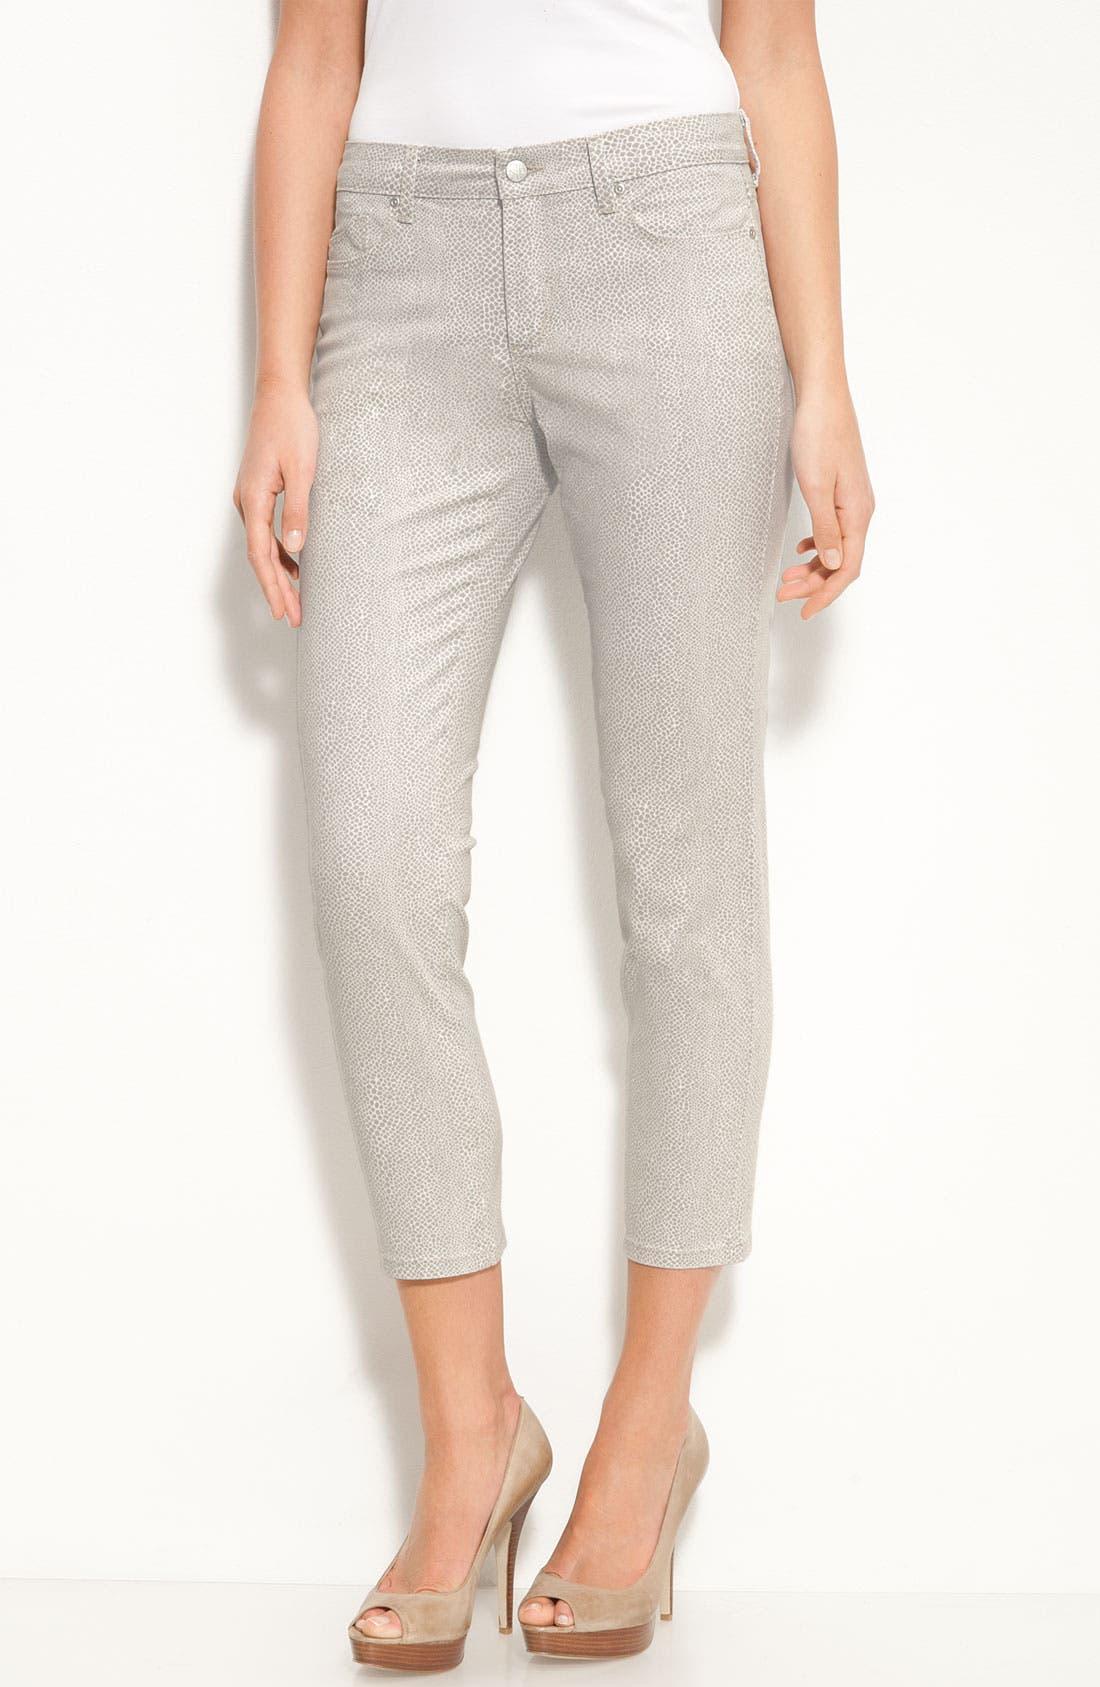 Main Image - NYDJ 'Alisha' Print Skinny Stretch Jeans (Petite)